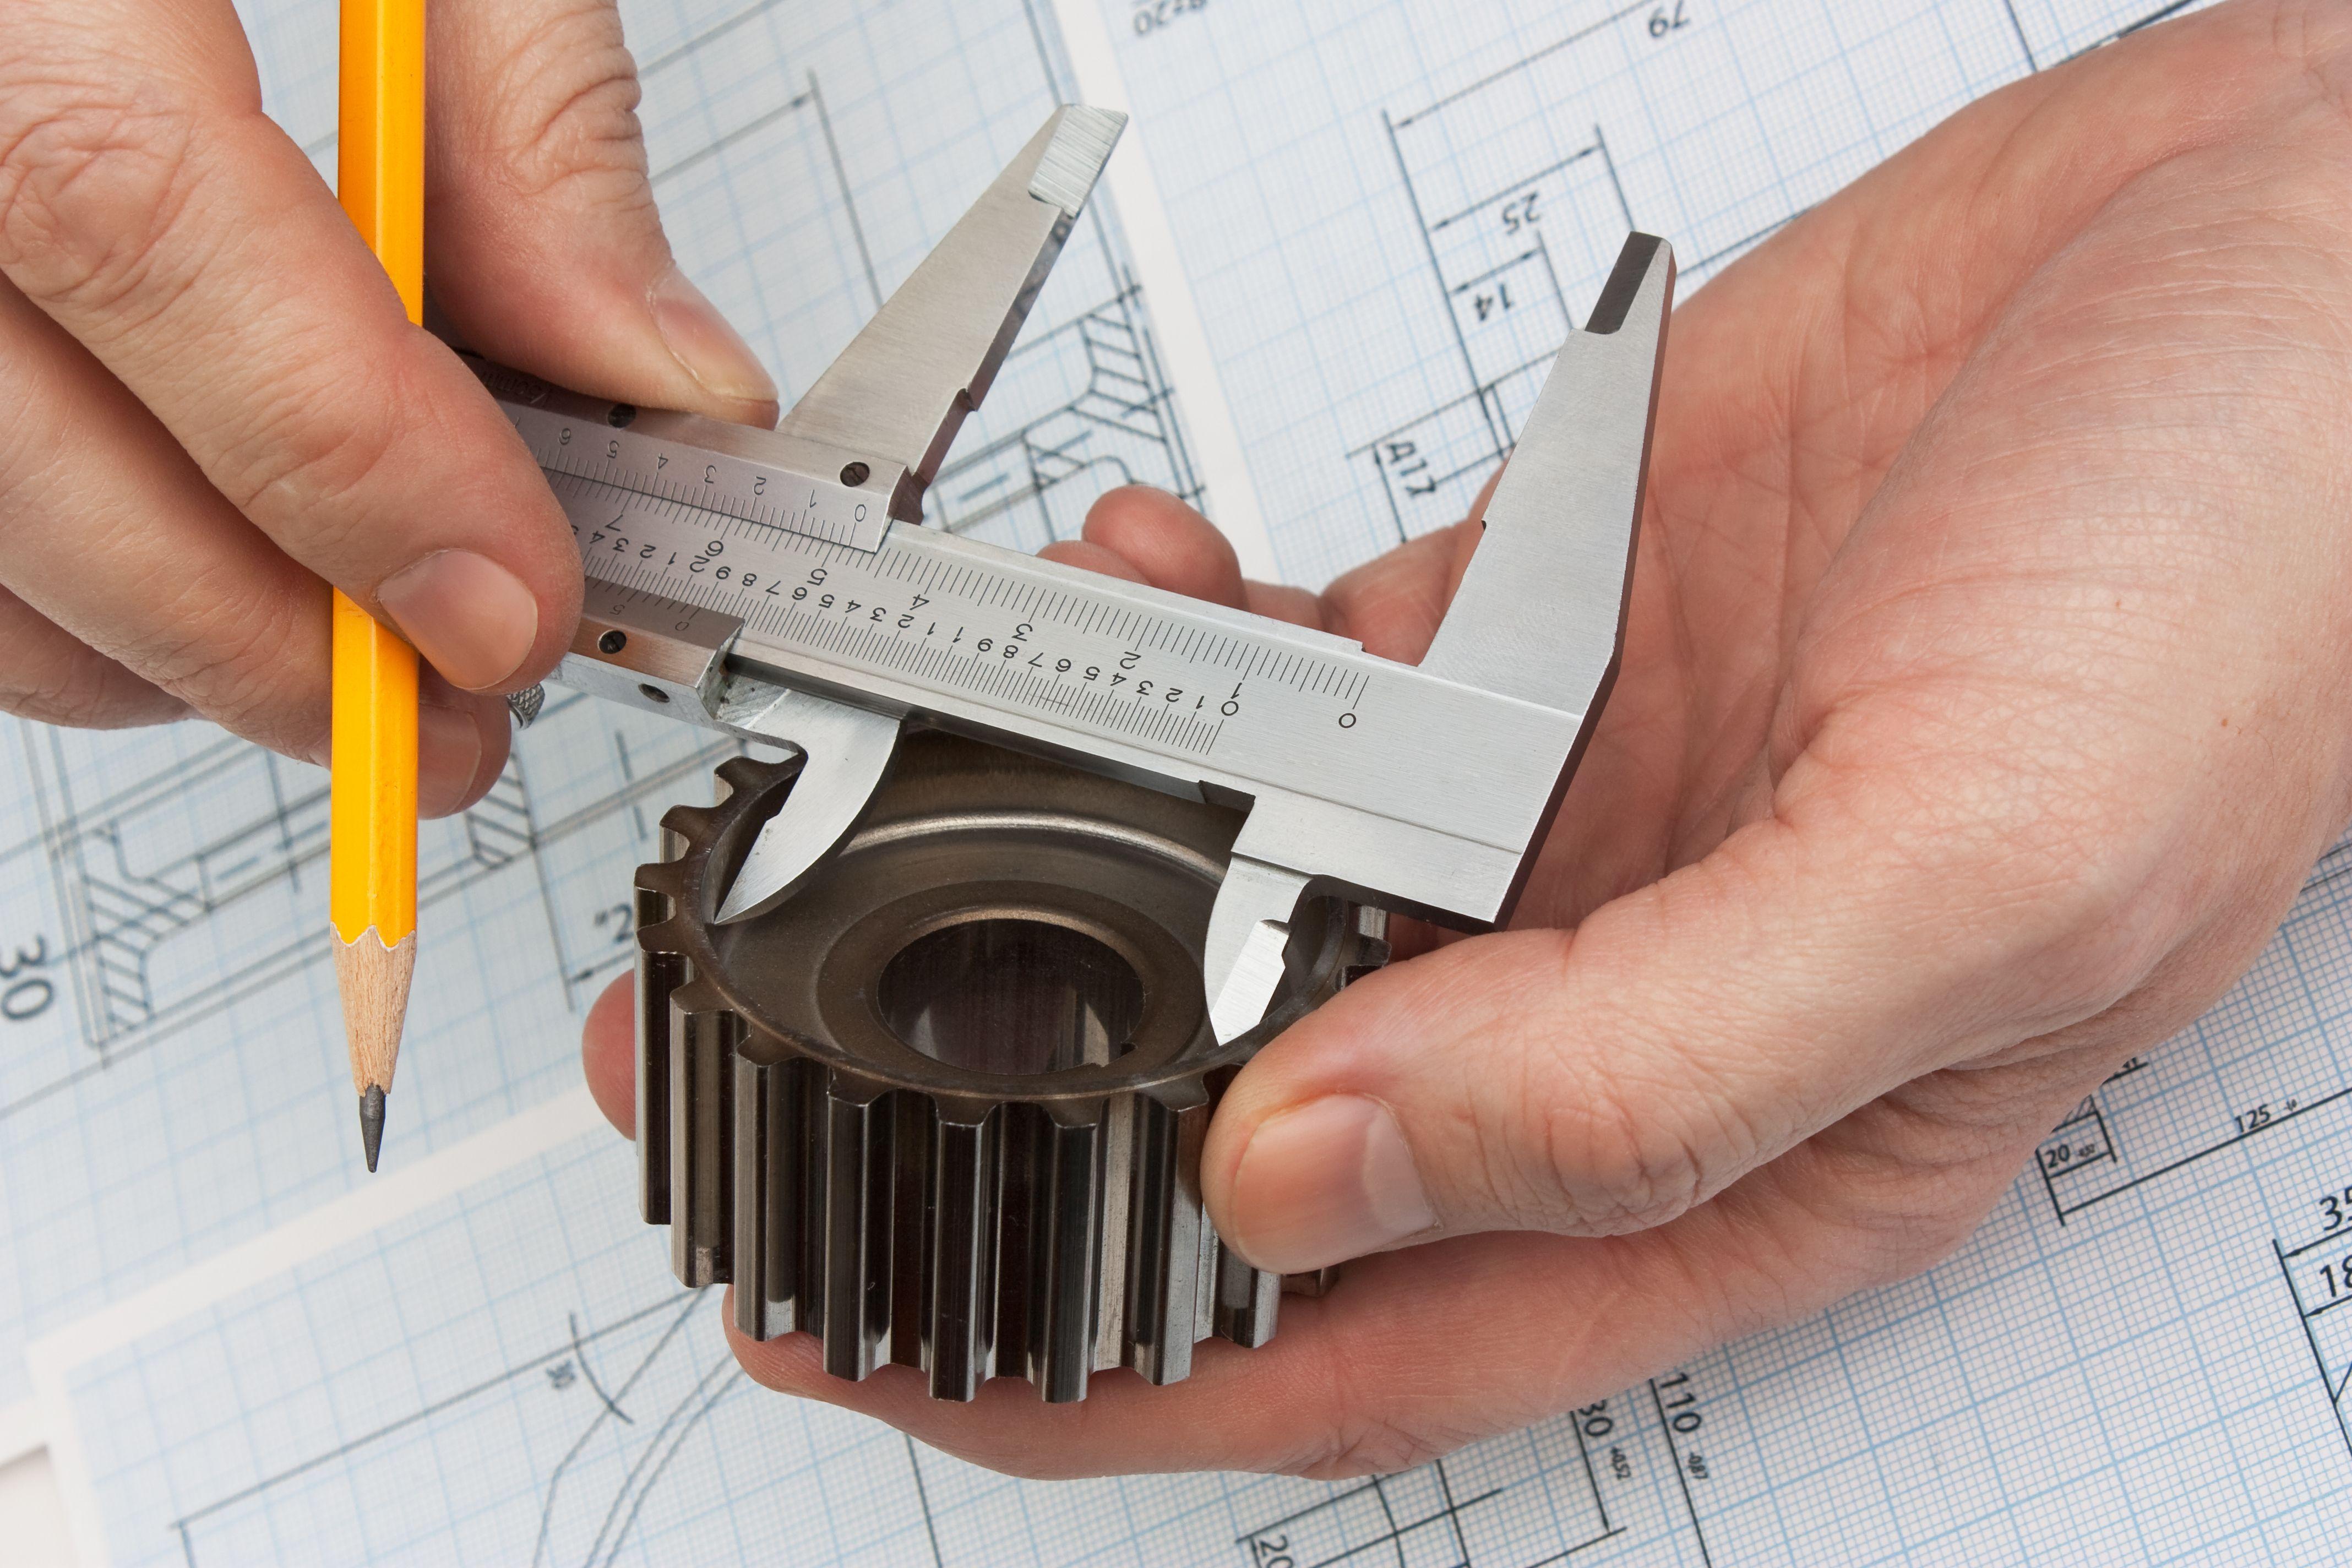 Online Assessment - Embedded Systems Engineer | Online